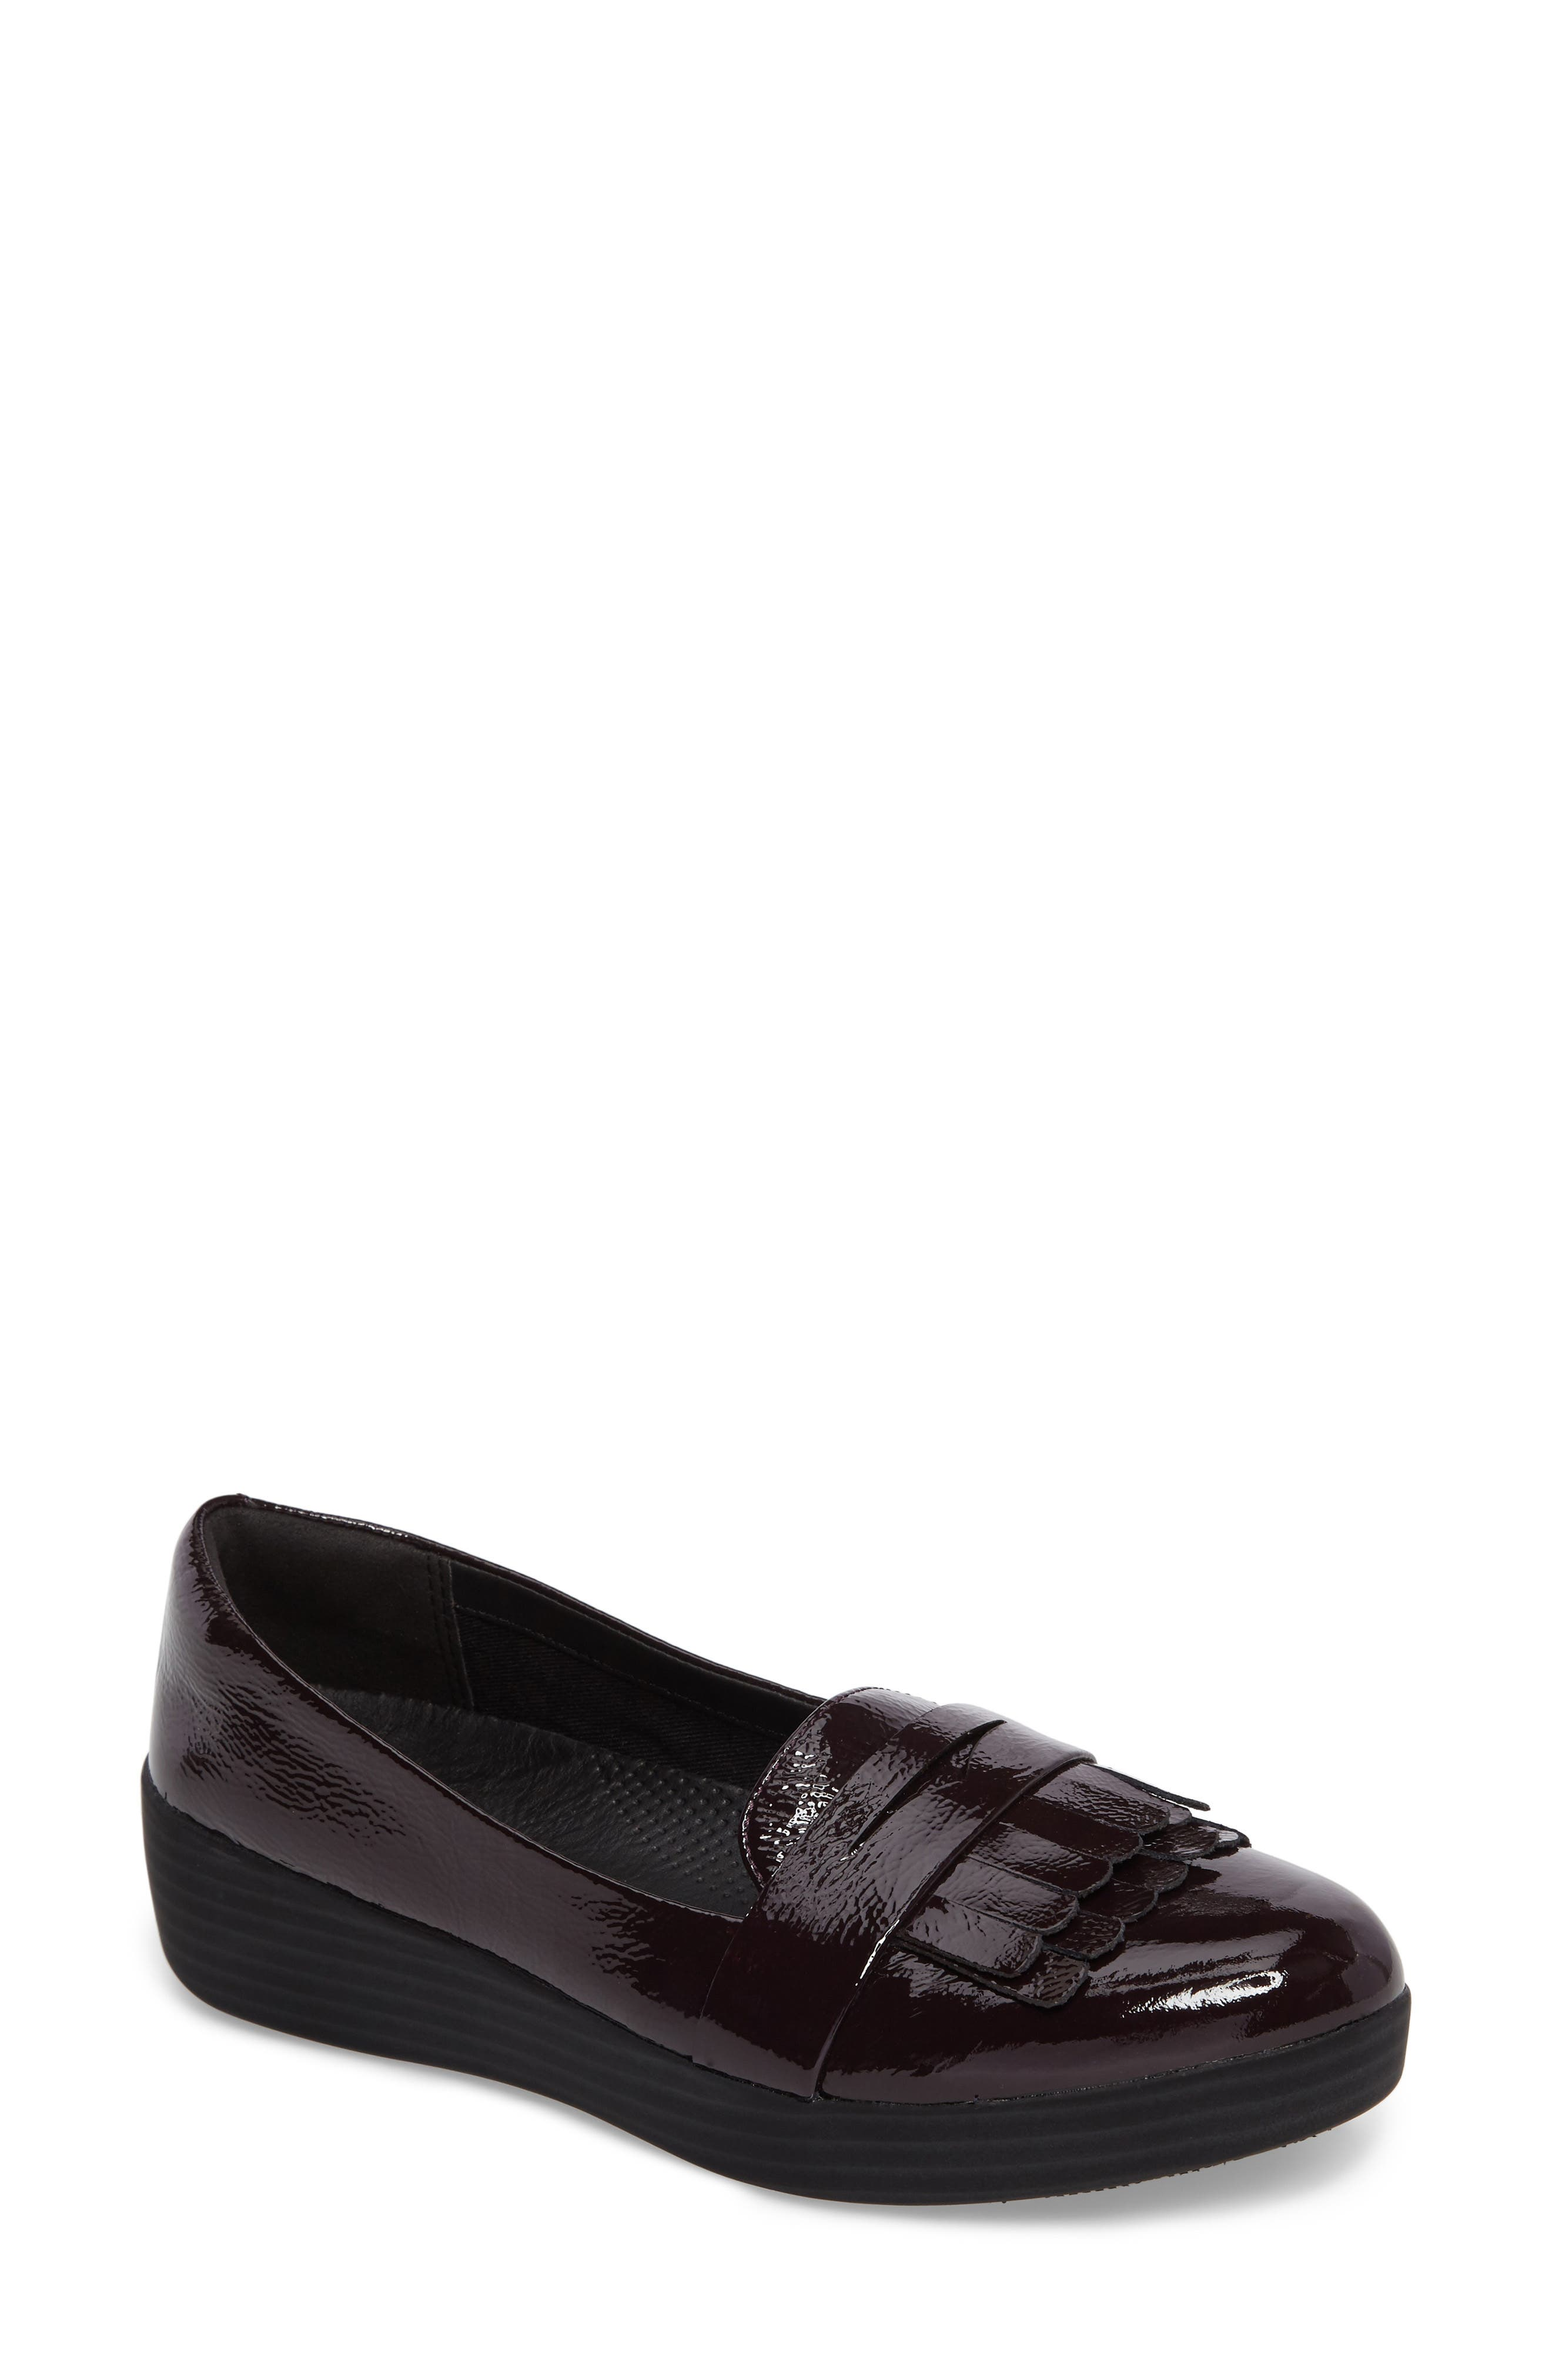 Main Image - FitFlop™ Fringey Sneakerloafer Slip-On (Women)